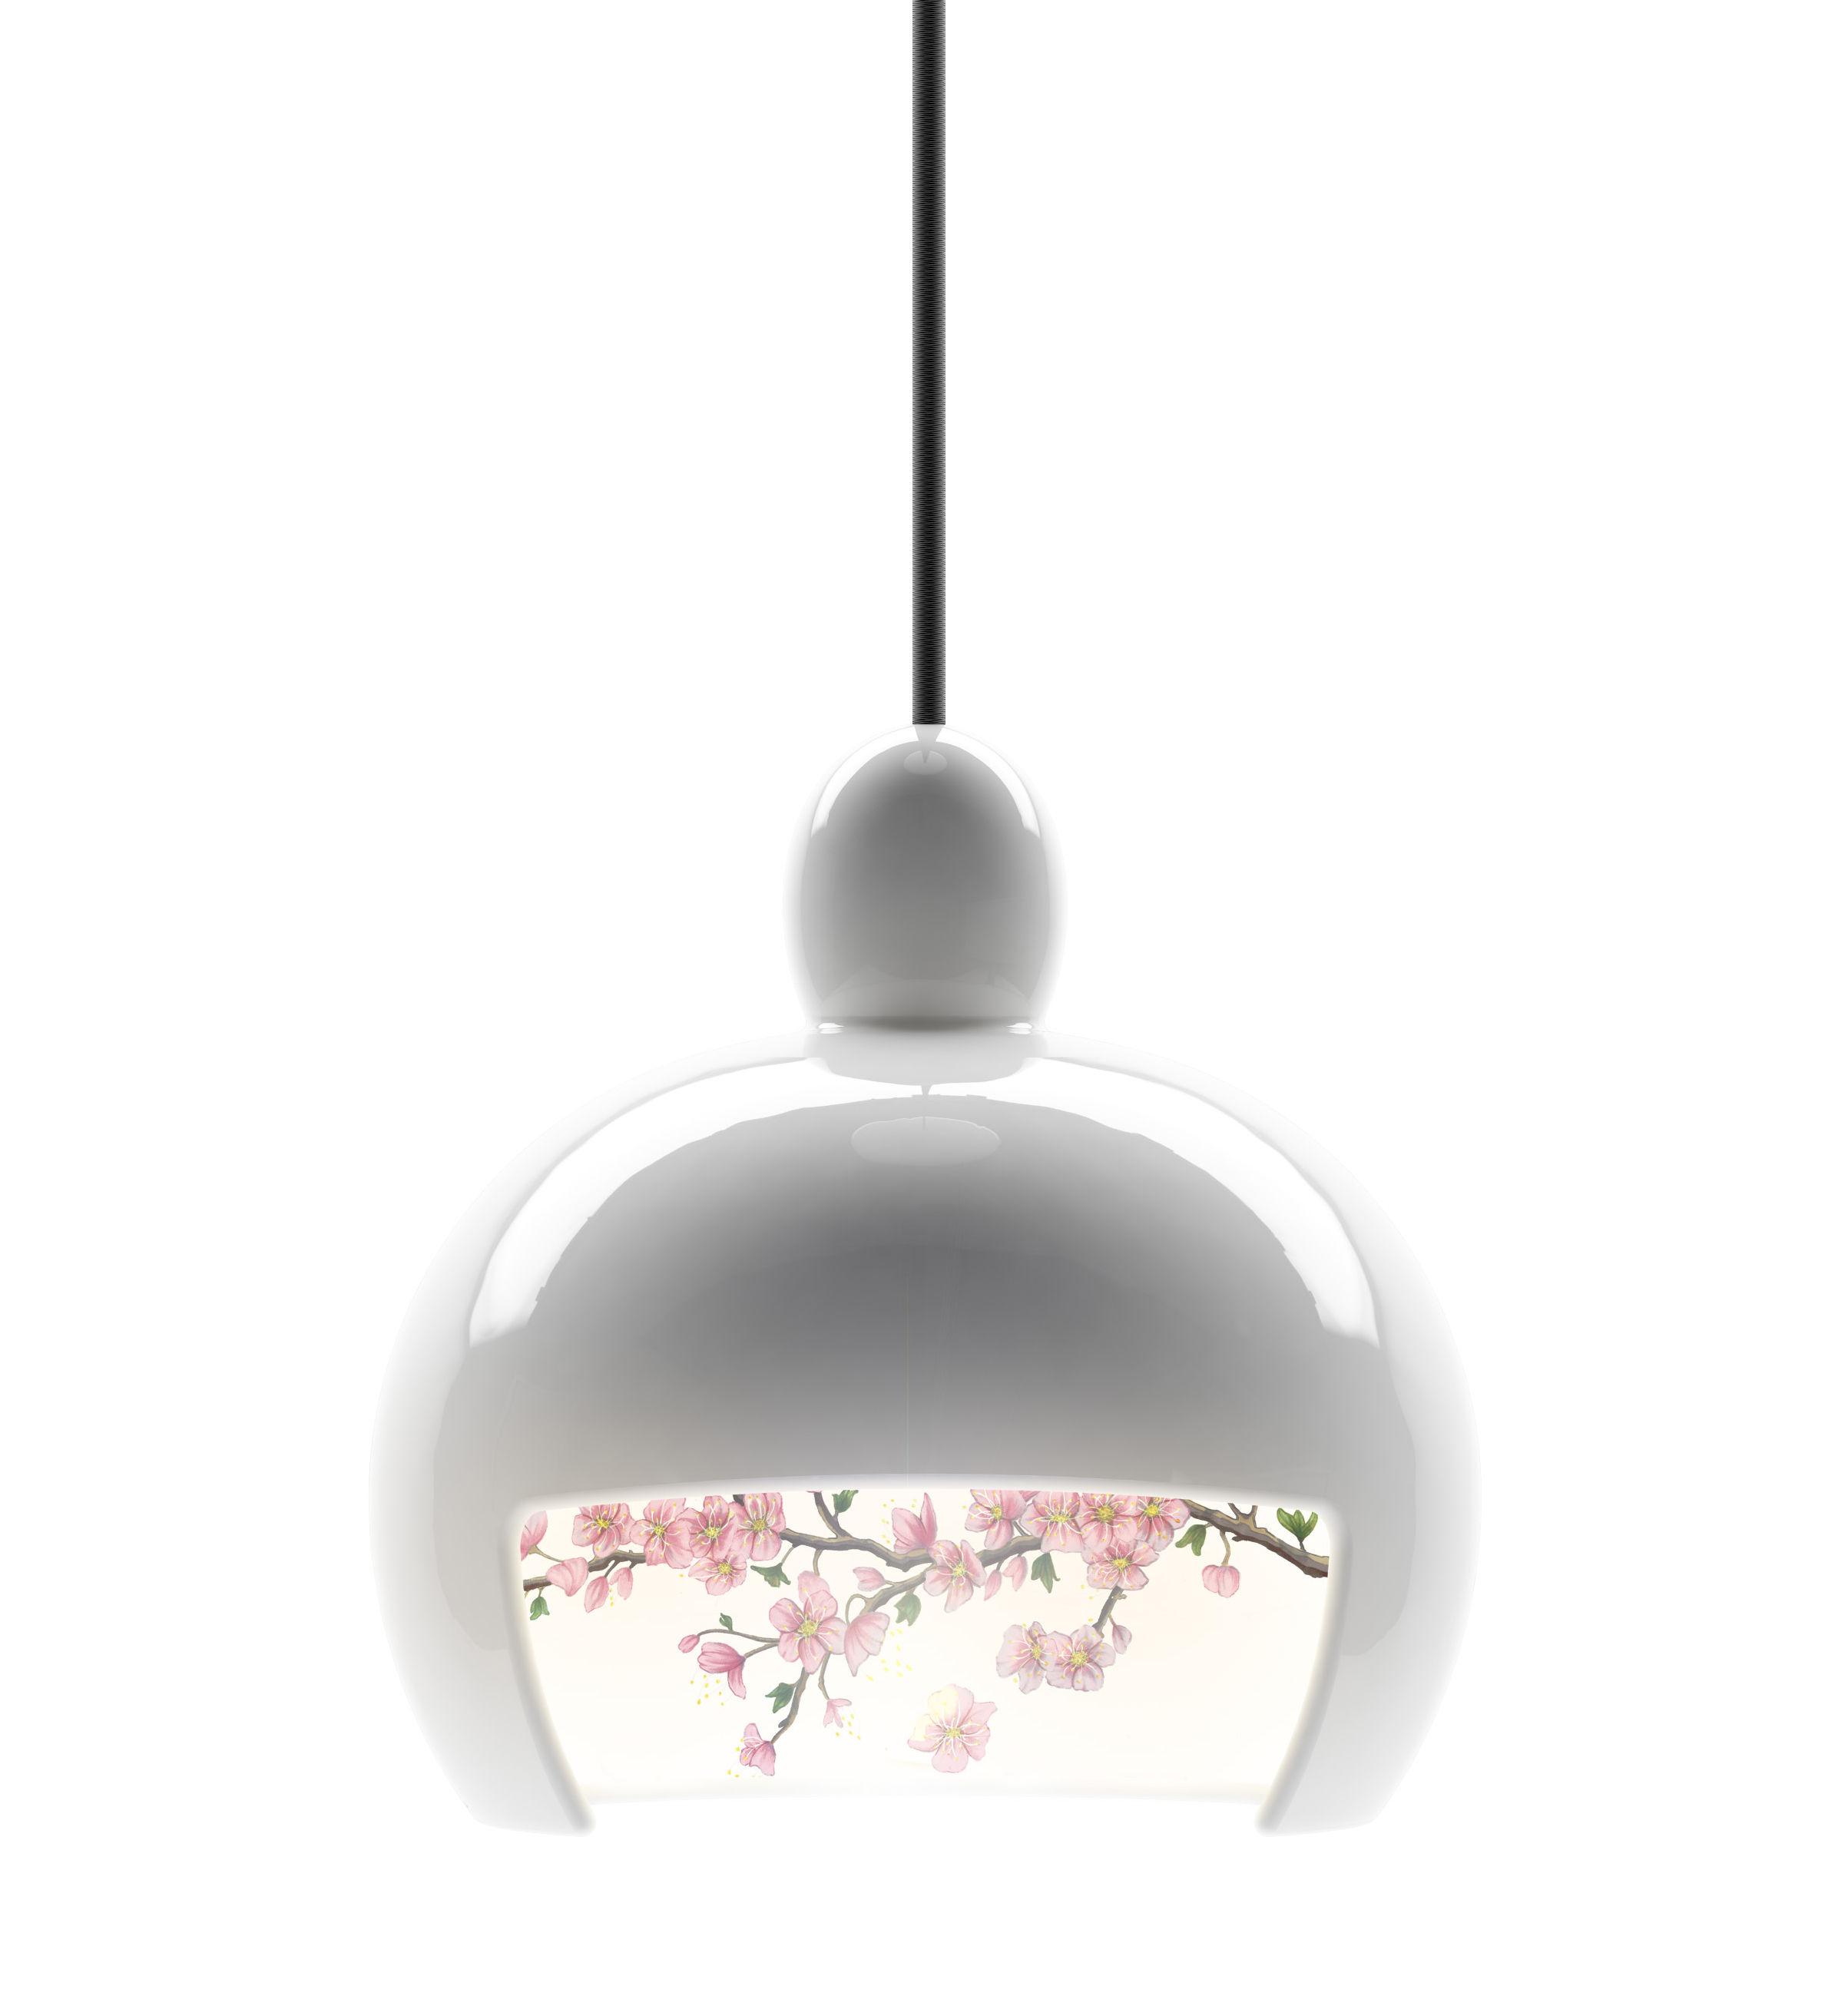 Lighting - Pendant Lighting - Juuyo - Peach Flowers Pendant by Moooi - White - Peach Flowers - Ceramic, Textile